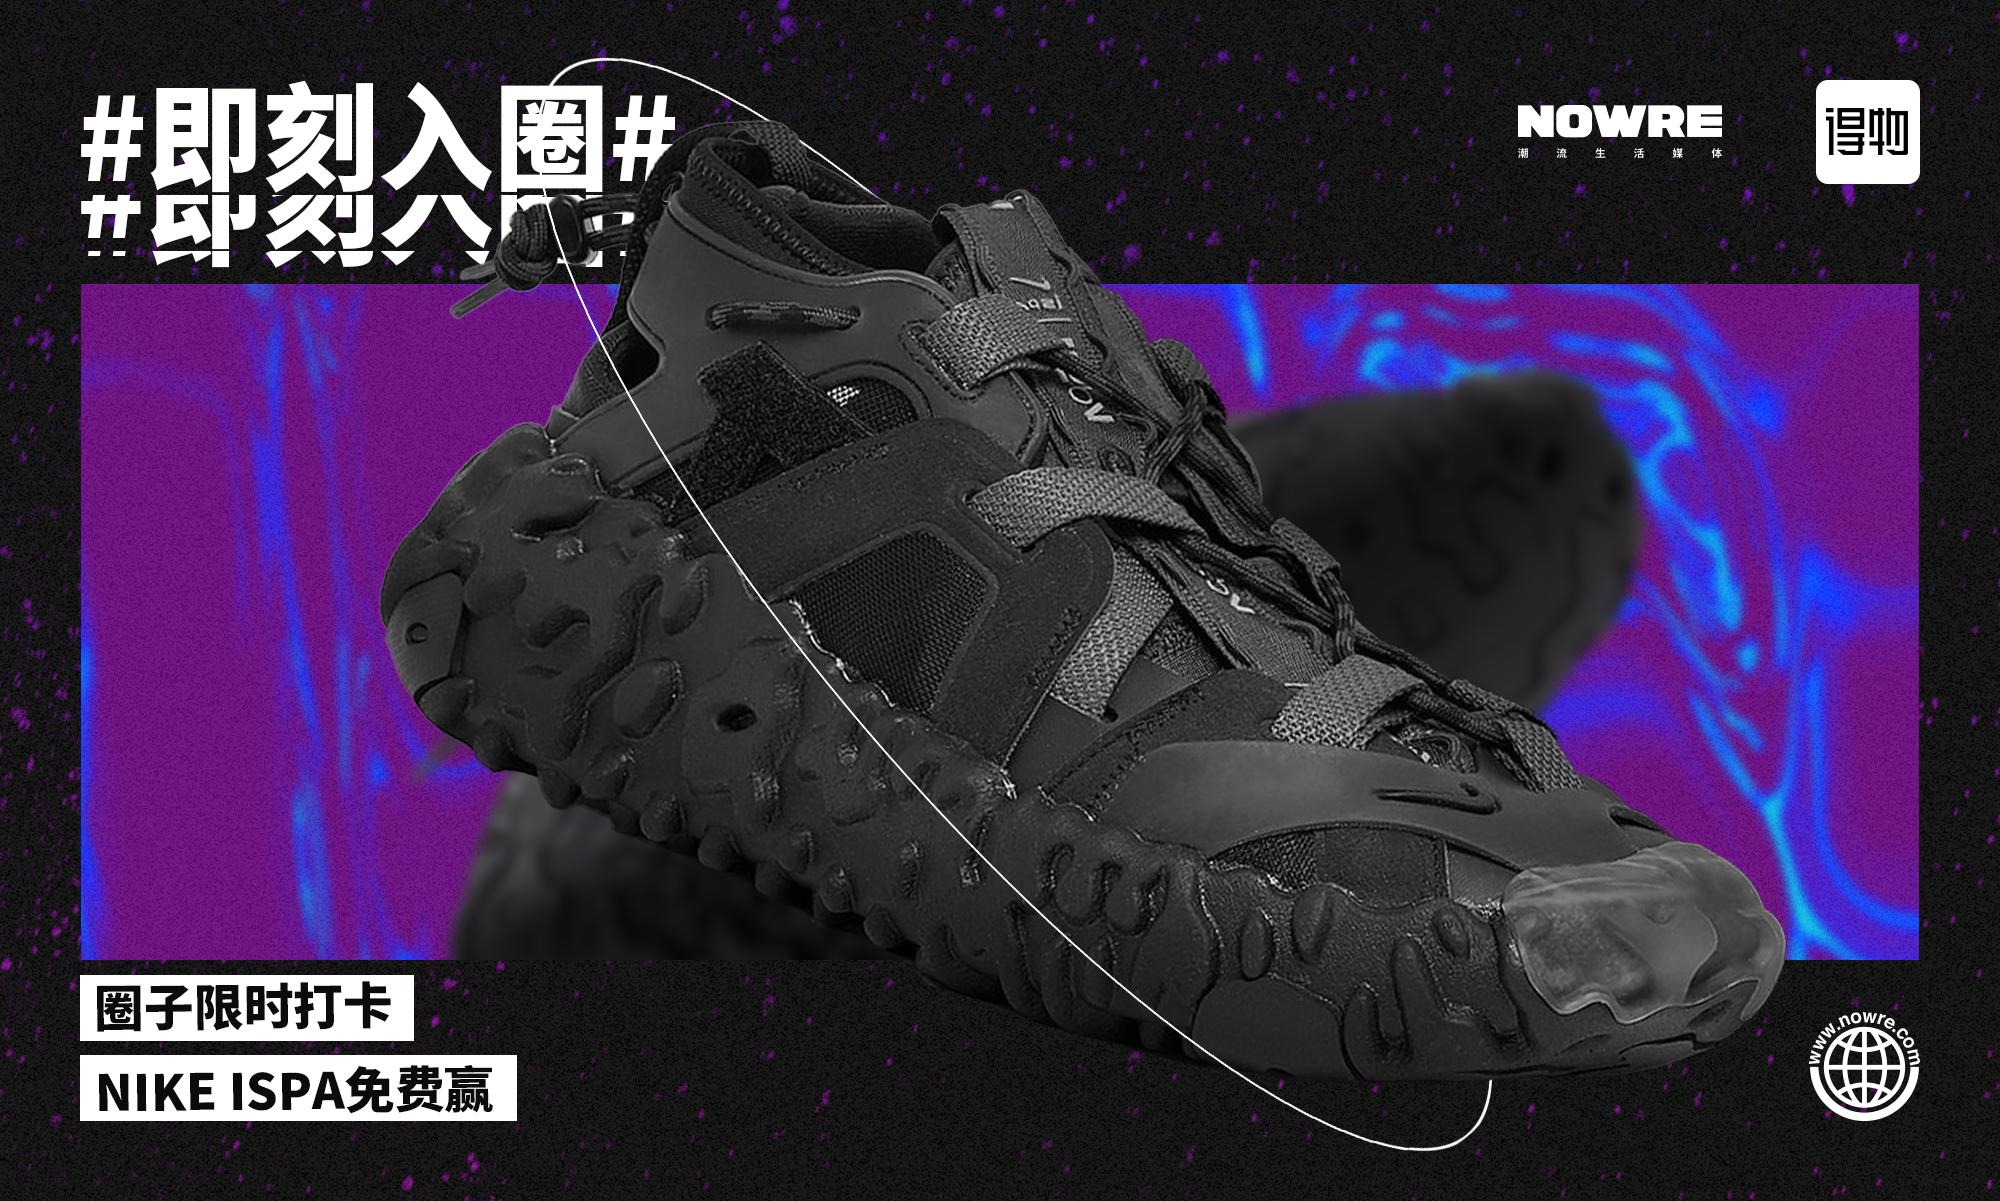 Nike ISPA 免费赢,NOWRE「即刻入圈」3.0 正式启动